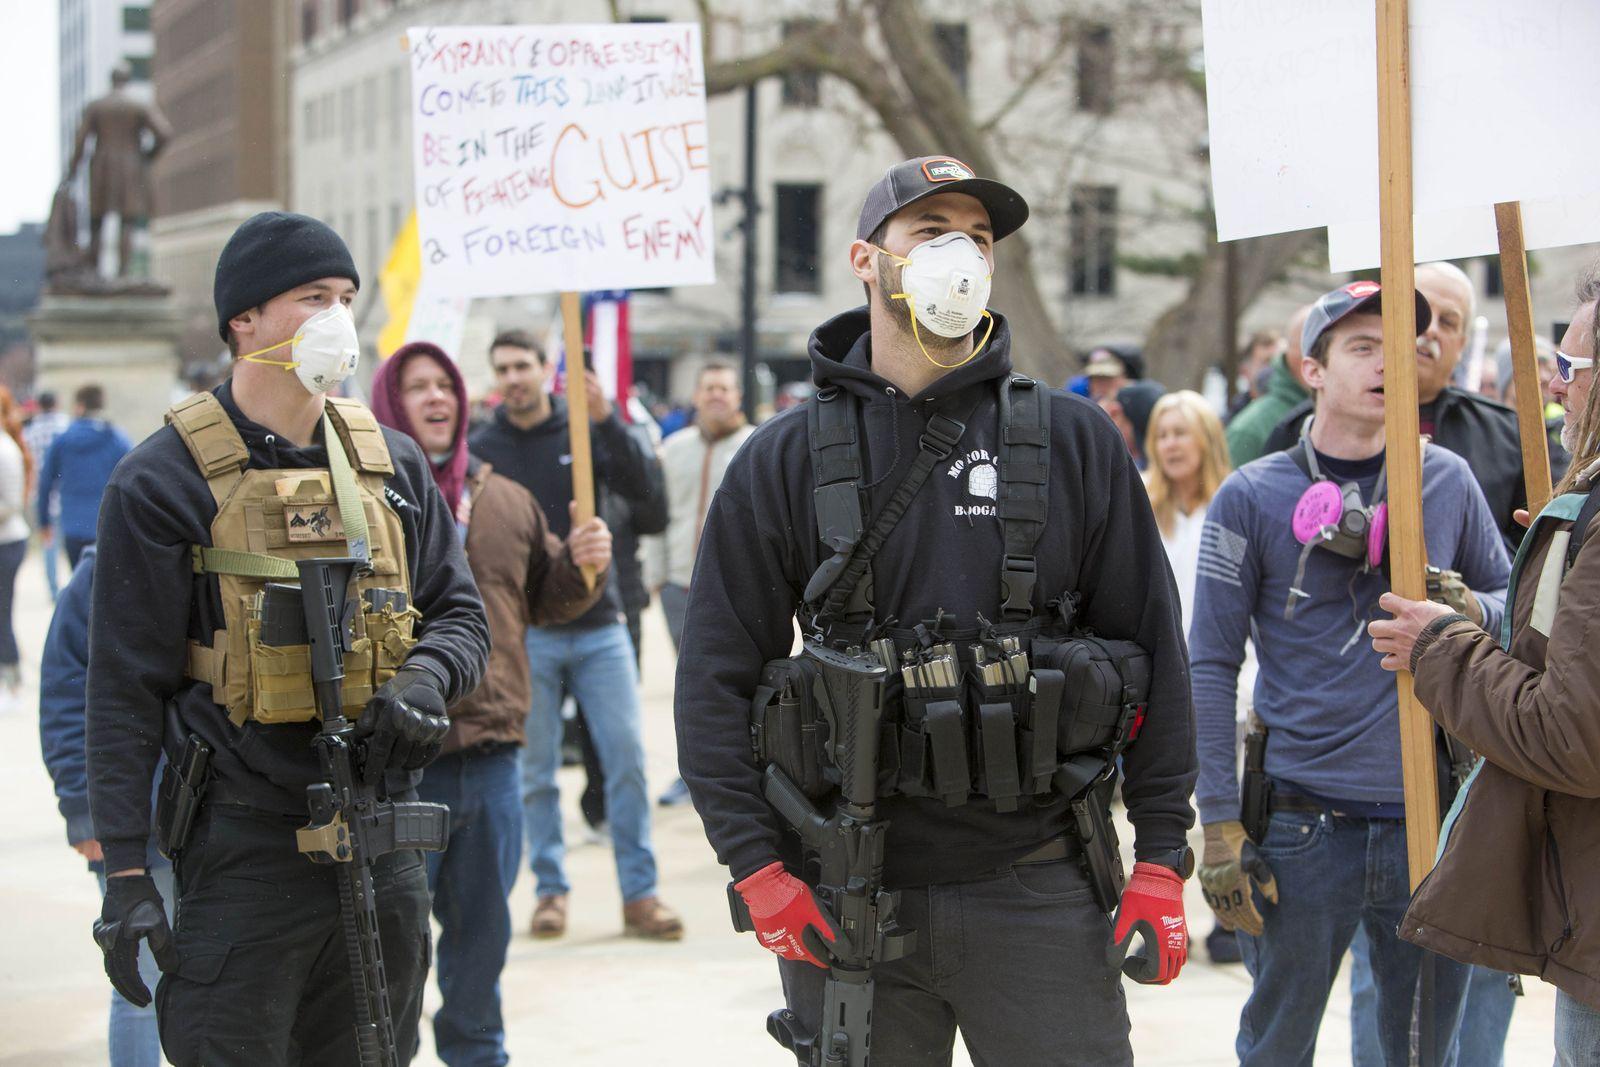 Protest against lockdown, Lansing, USA - 15 Apr 2020